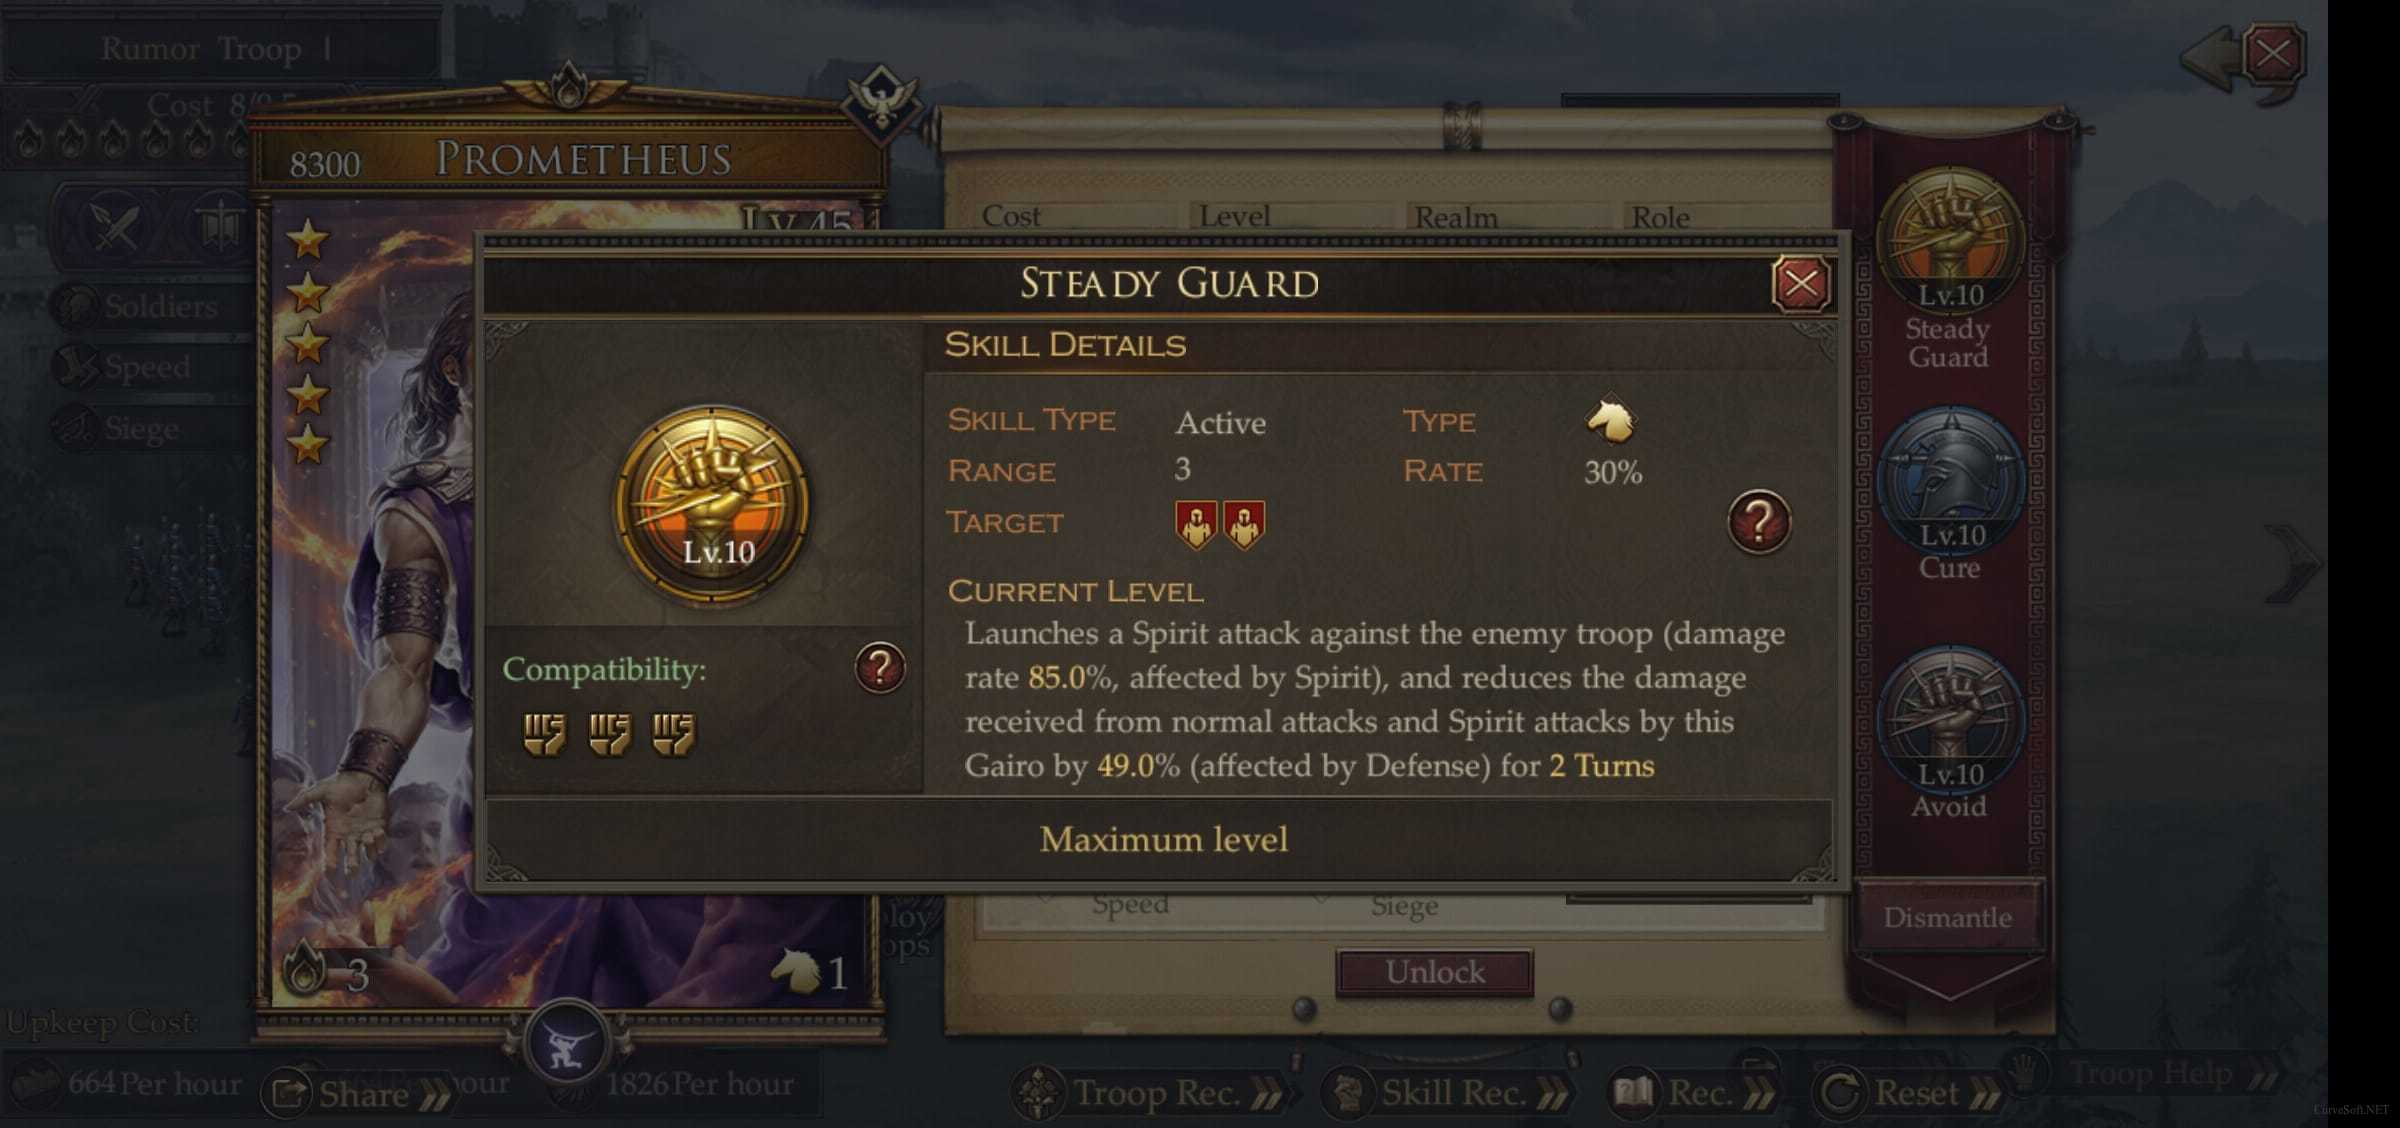 Steady Guard